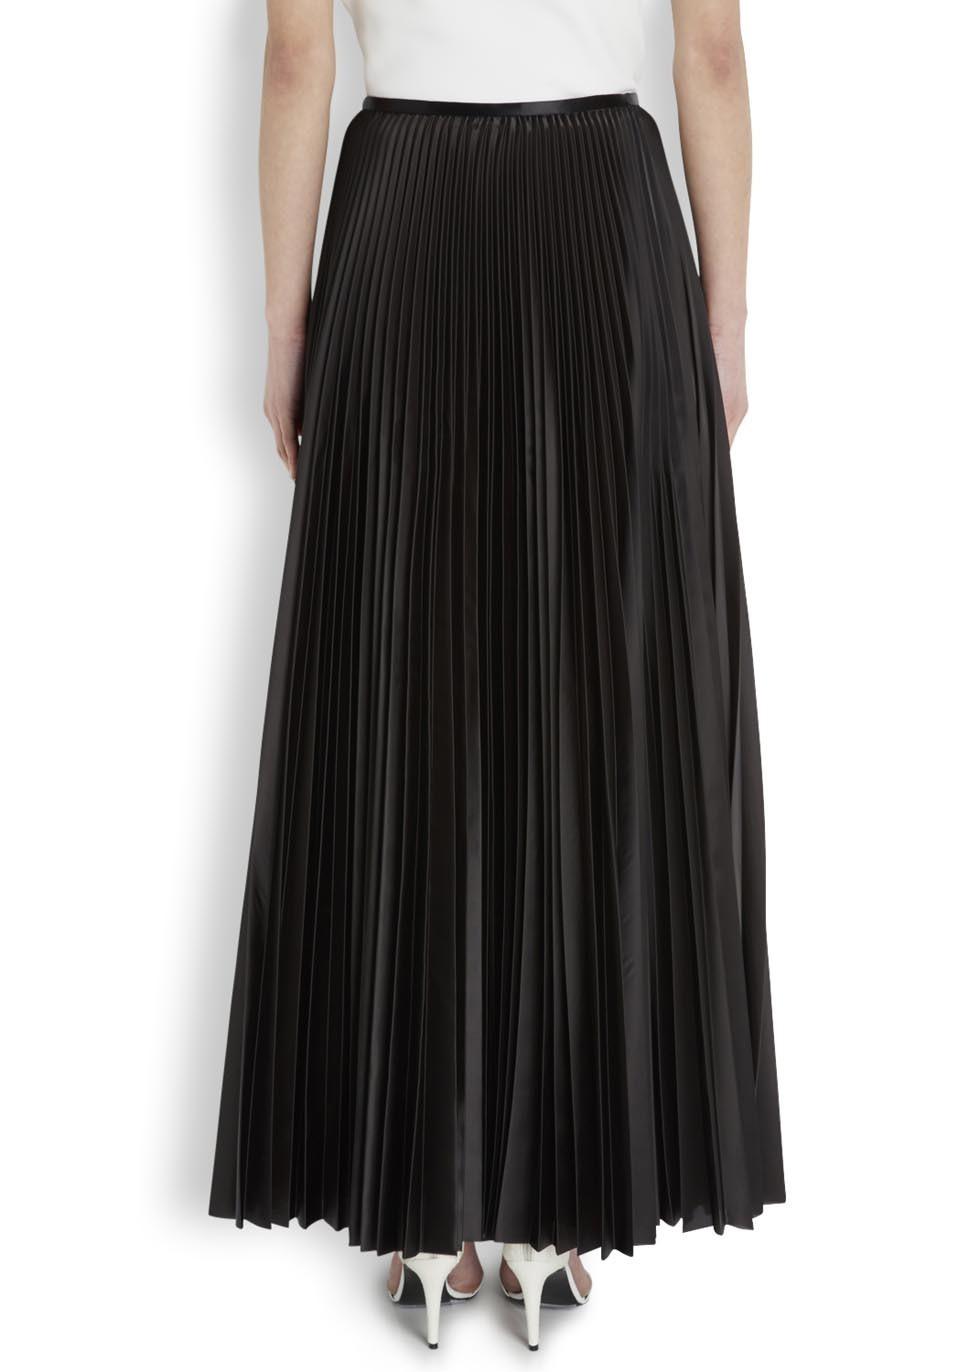 8accfcb3d5 Christopher Kane Black Pleated Satin Twill Maxi Skirt in Black - Lyst